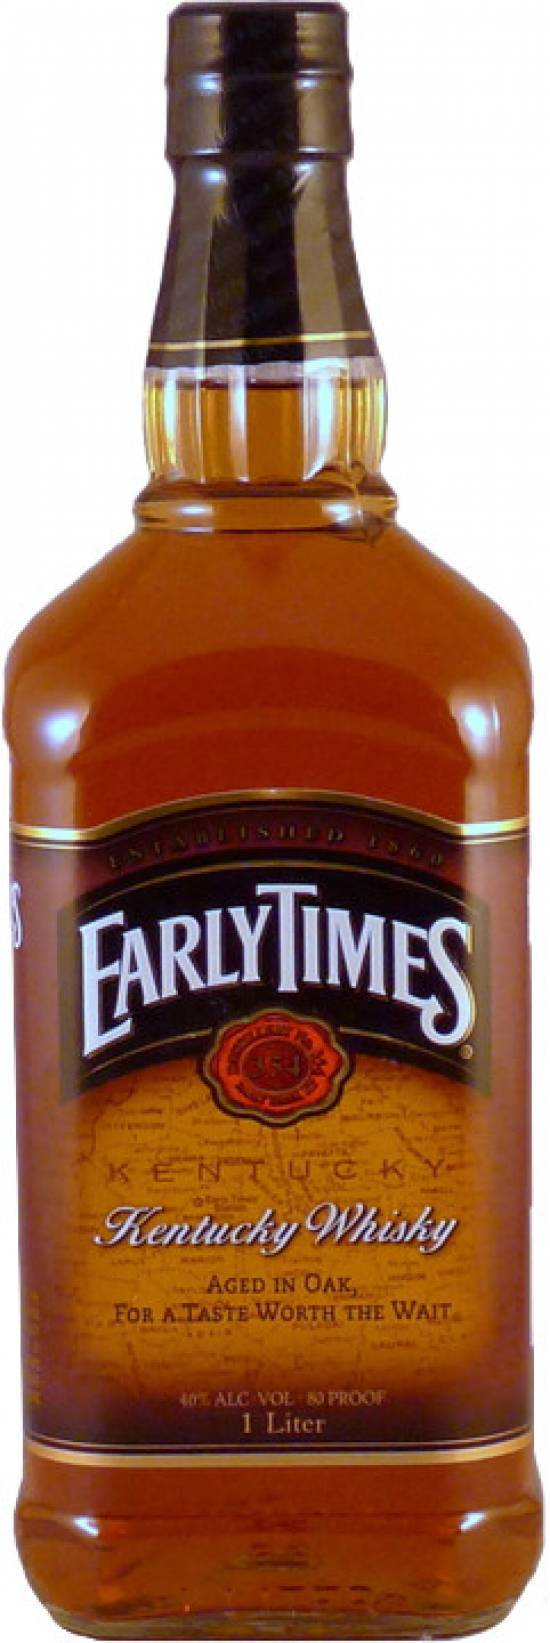 Виски early times (эрли таймс): описание, цена и стоимость